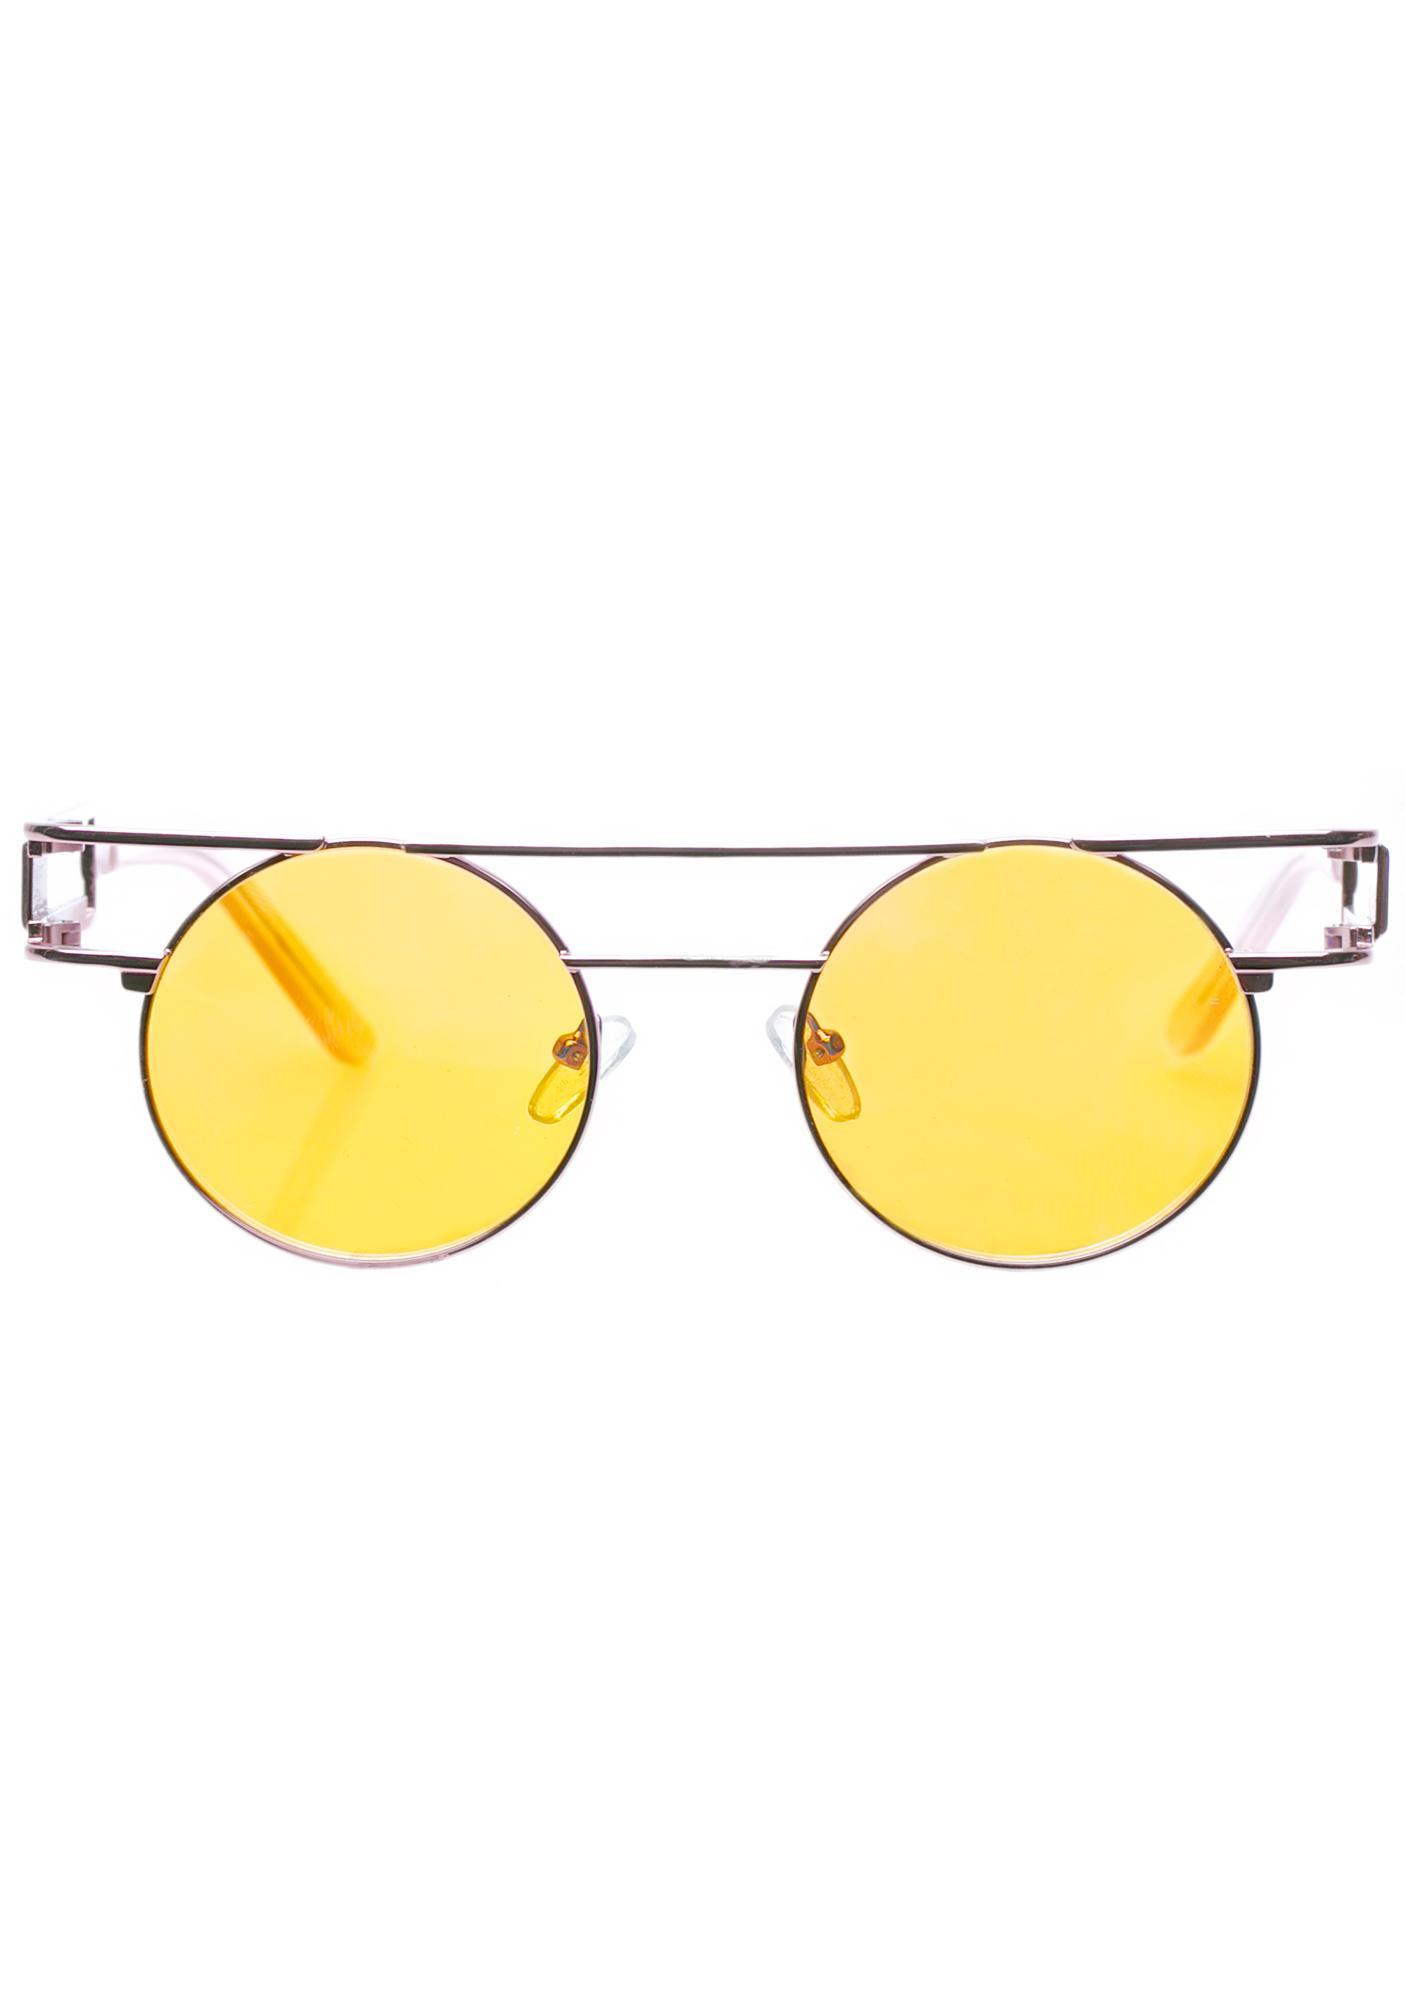 ESQAPE Speqz Pink Holo Sunglasses